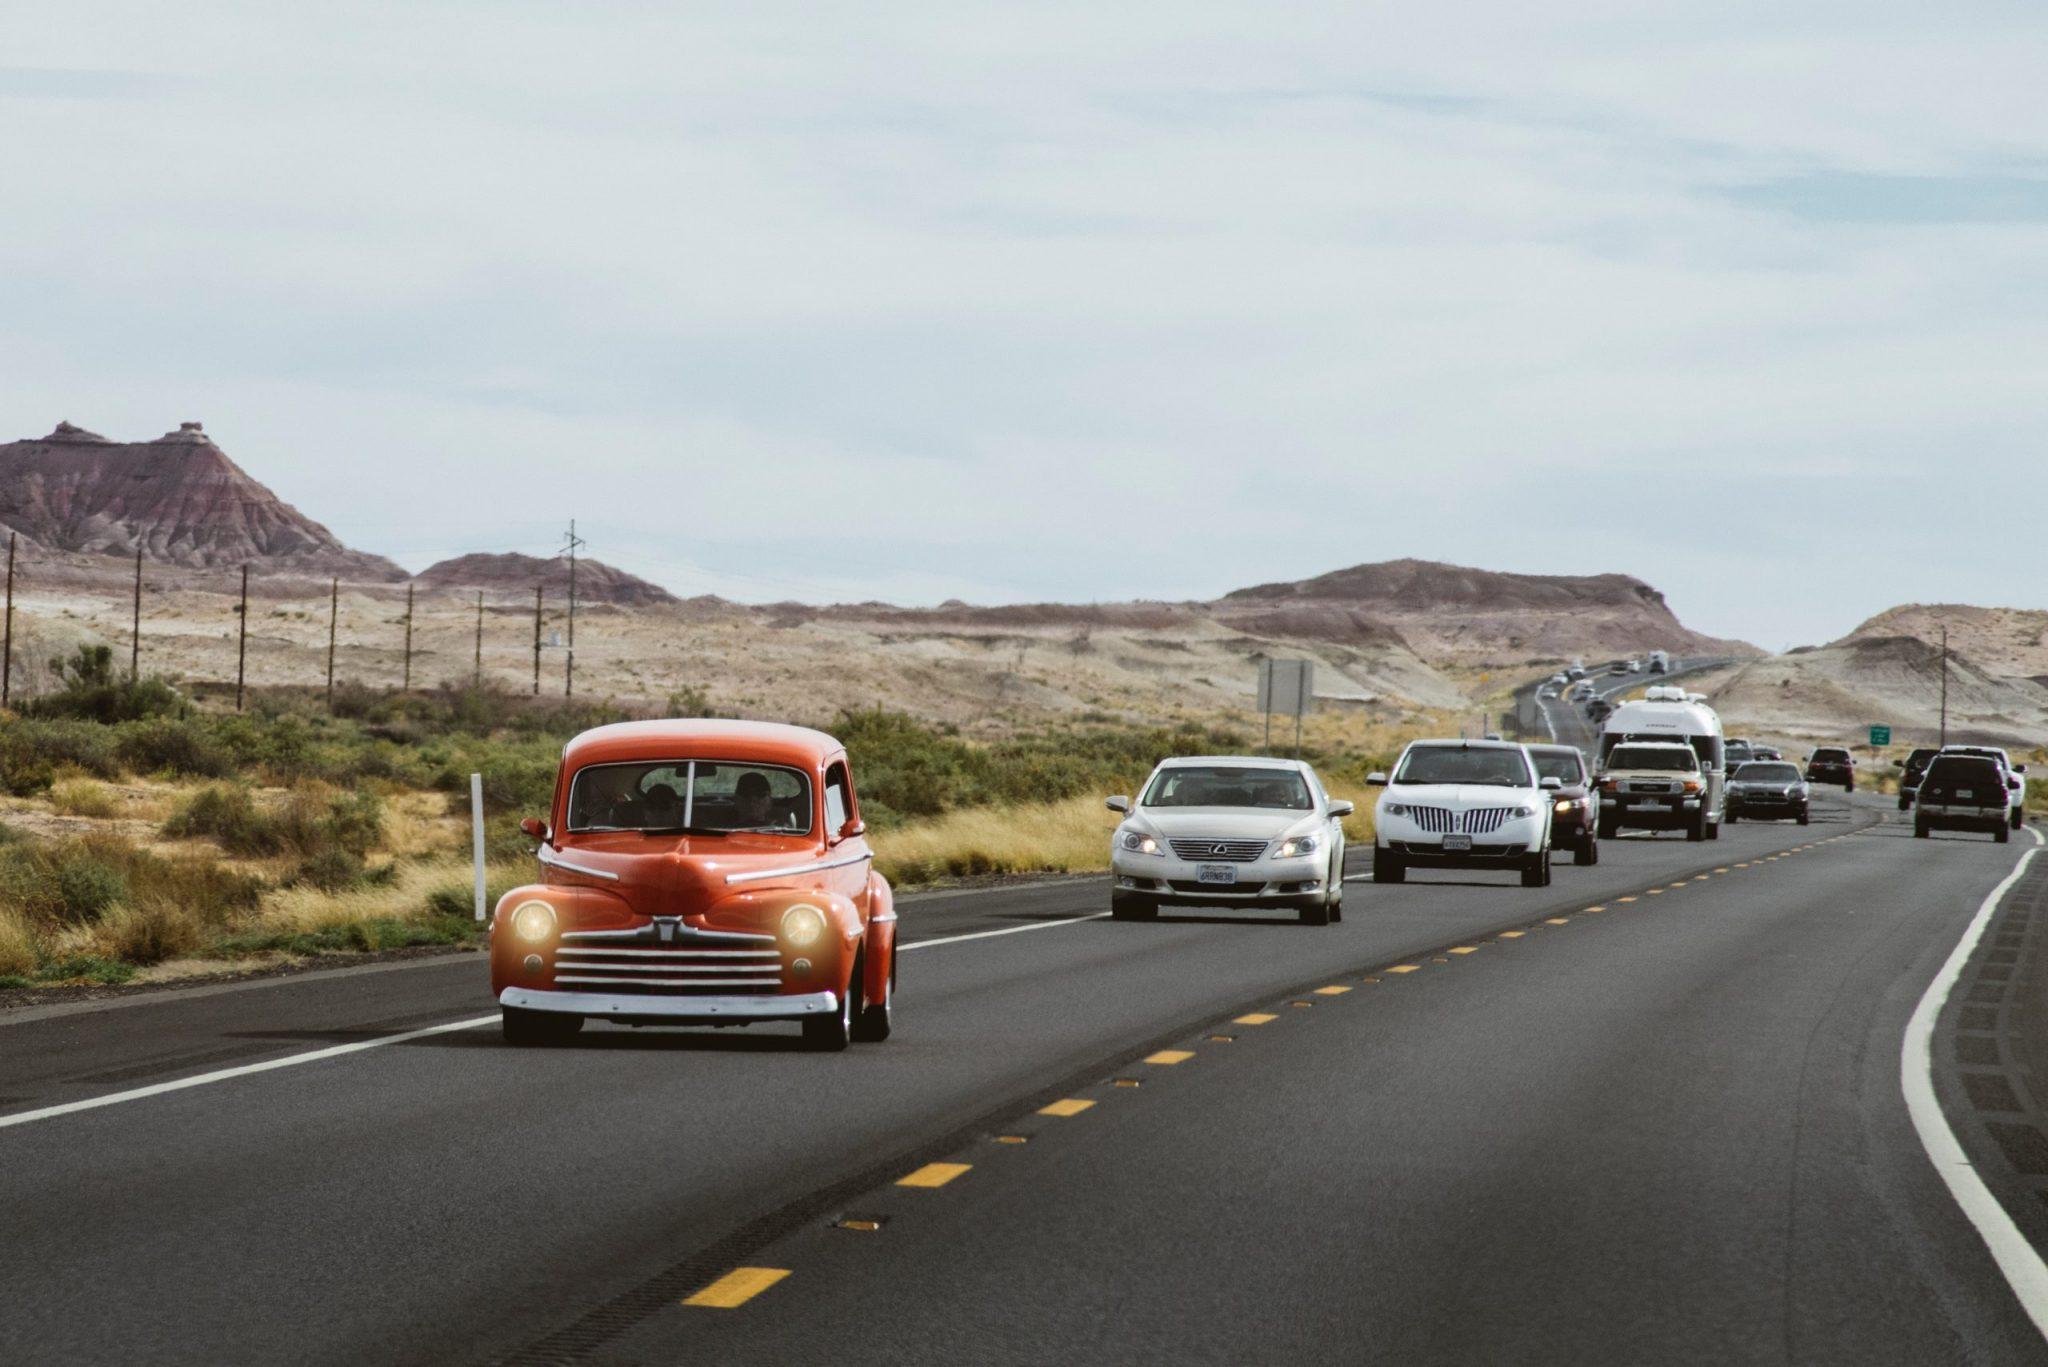 arizona-asphalt-automobiles-automotives-612888